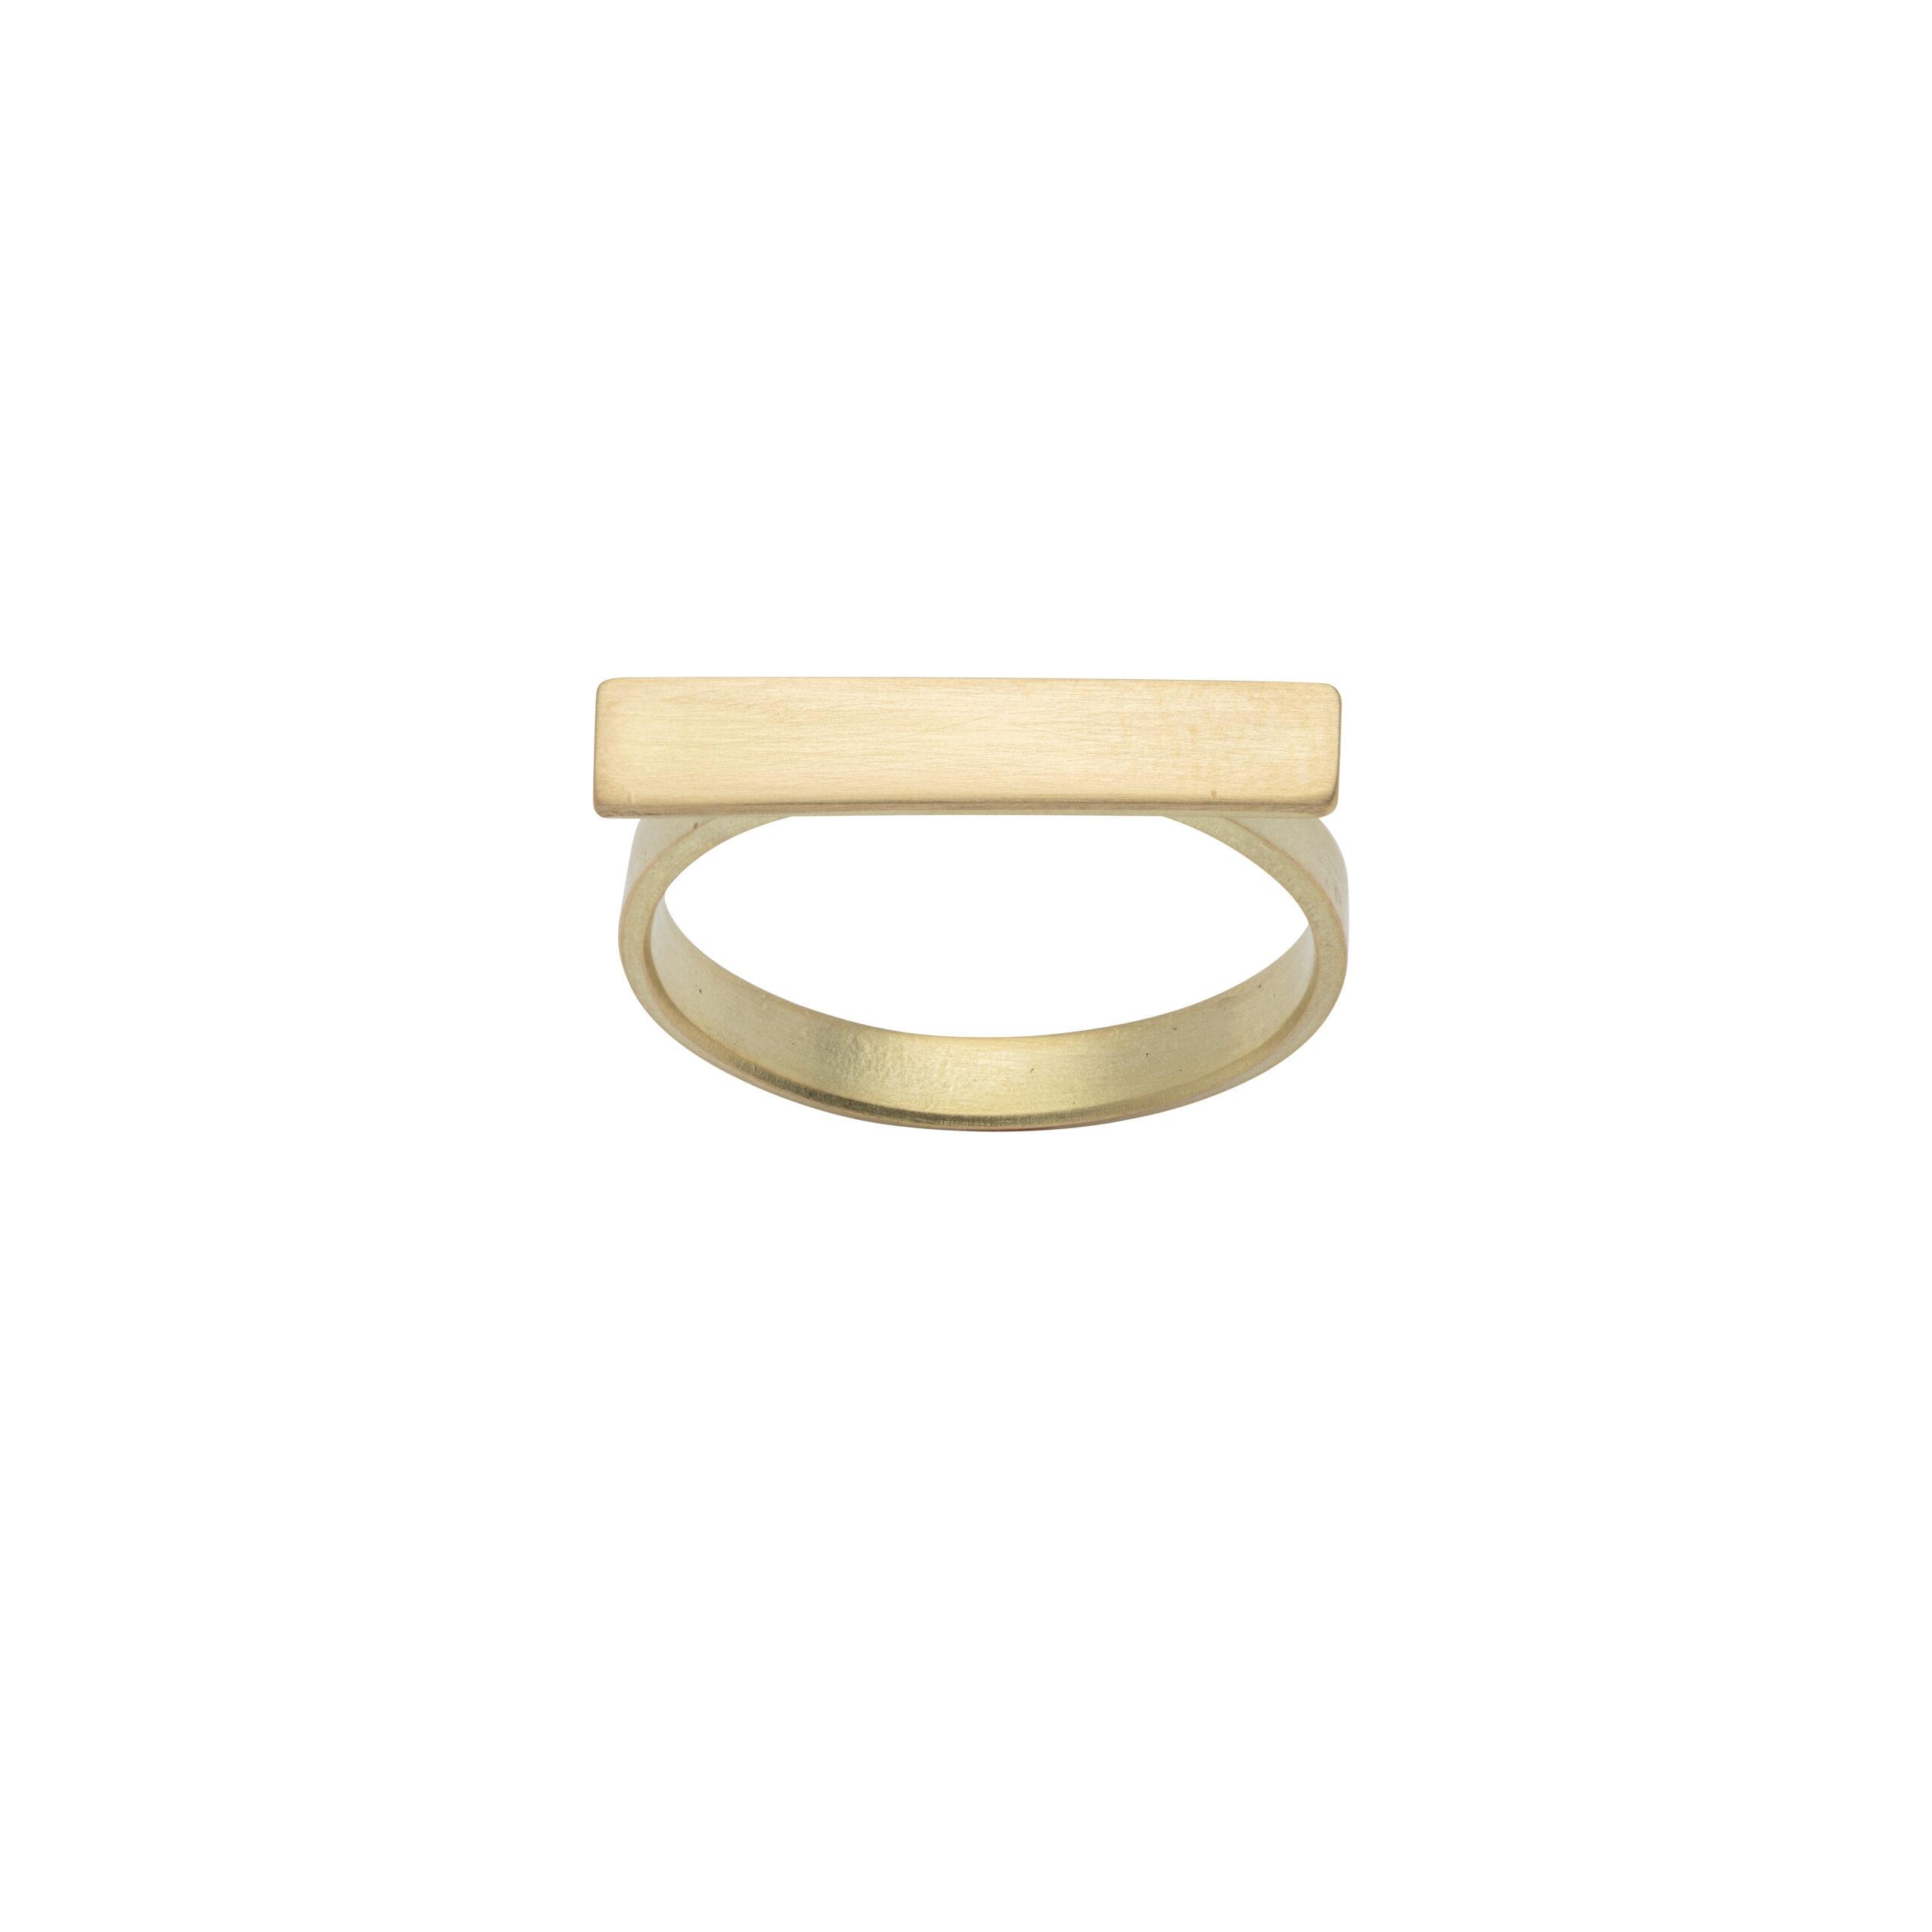 Kyla Katz Ring with Small Rectangular Head